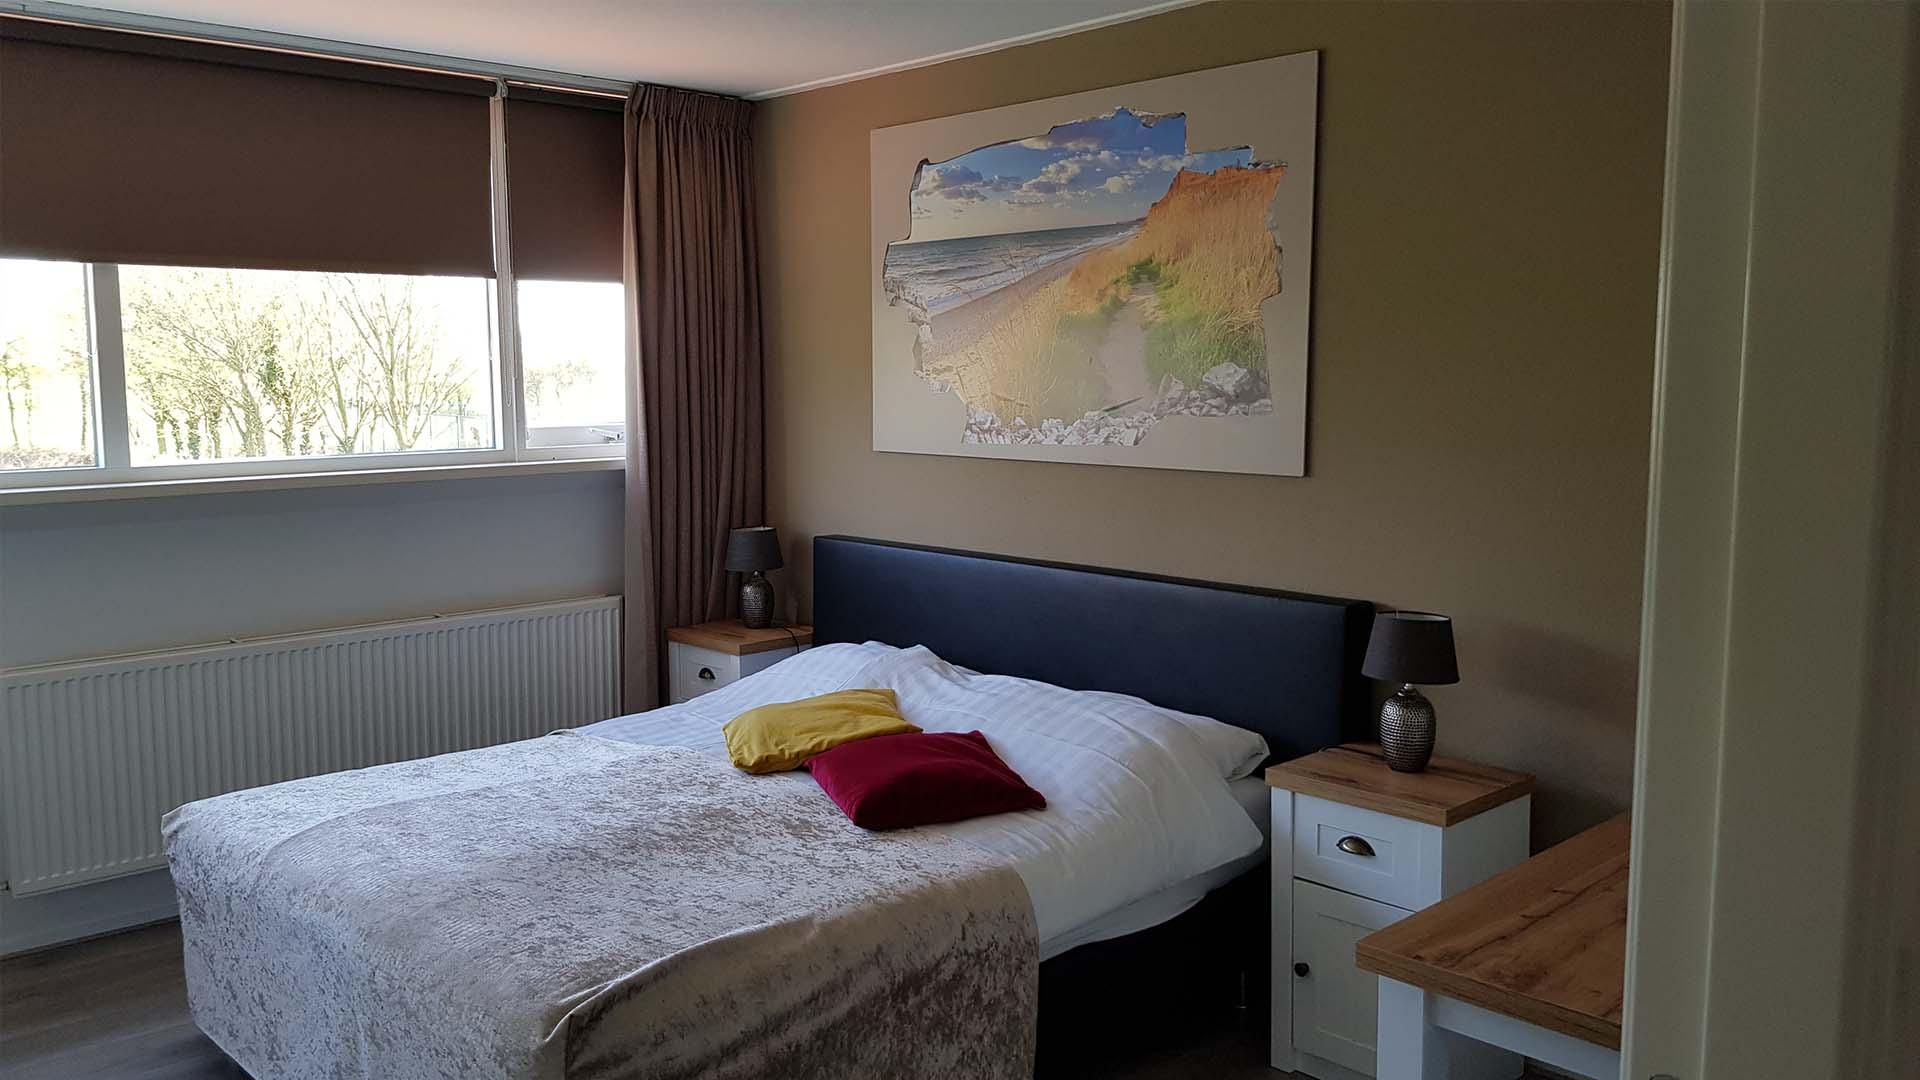 kamer 4 tweepersoonsbed B&B Plompetorenzicht Schouwen-Duiveland Zeeland